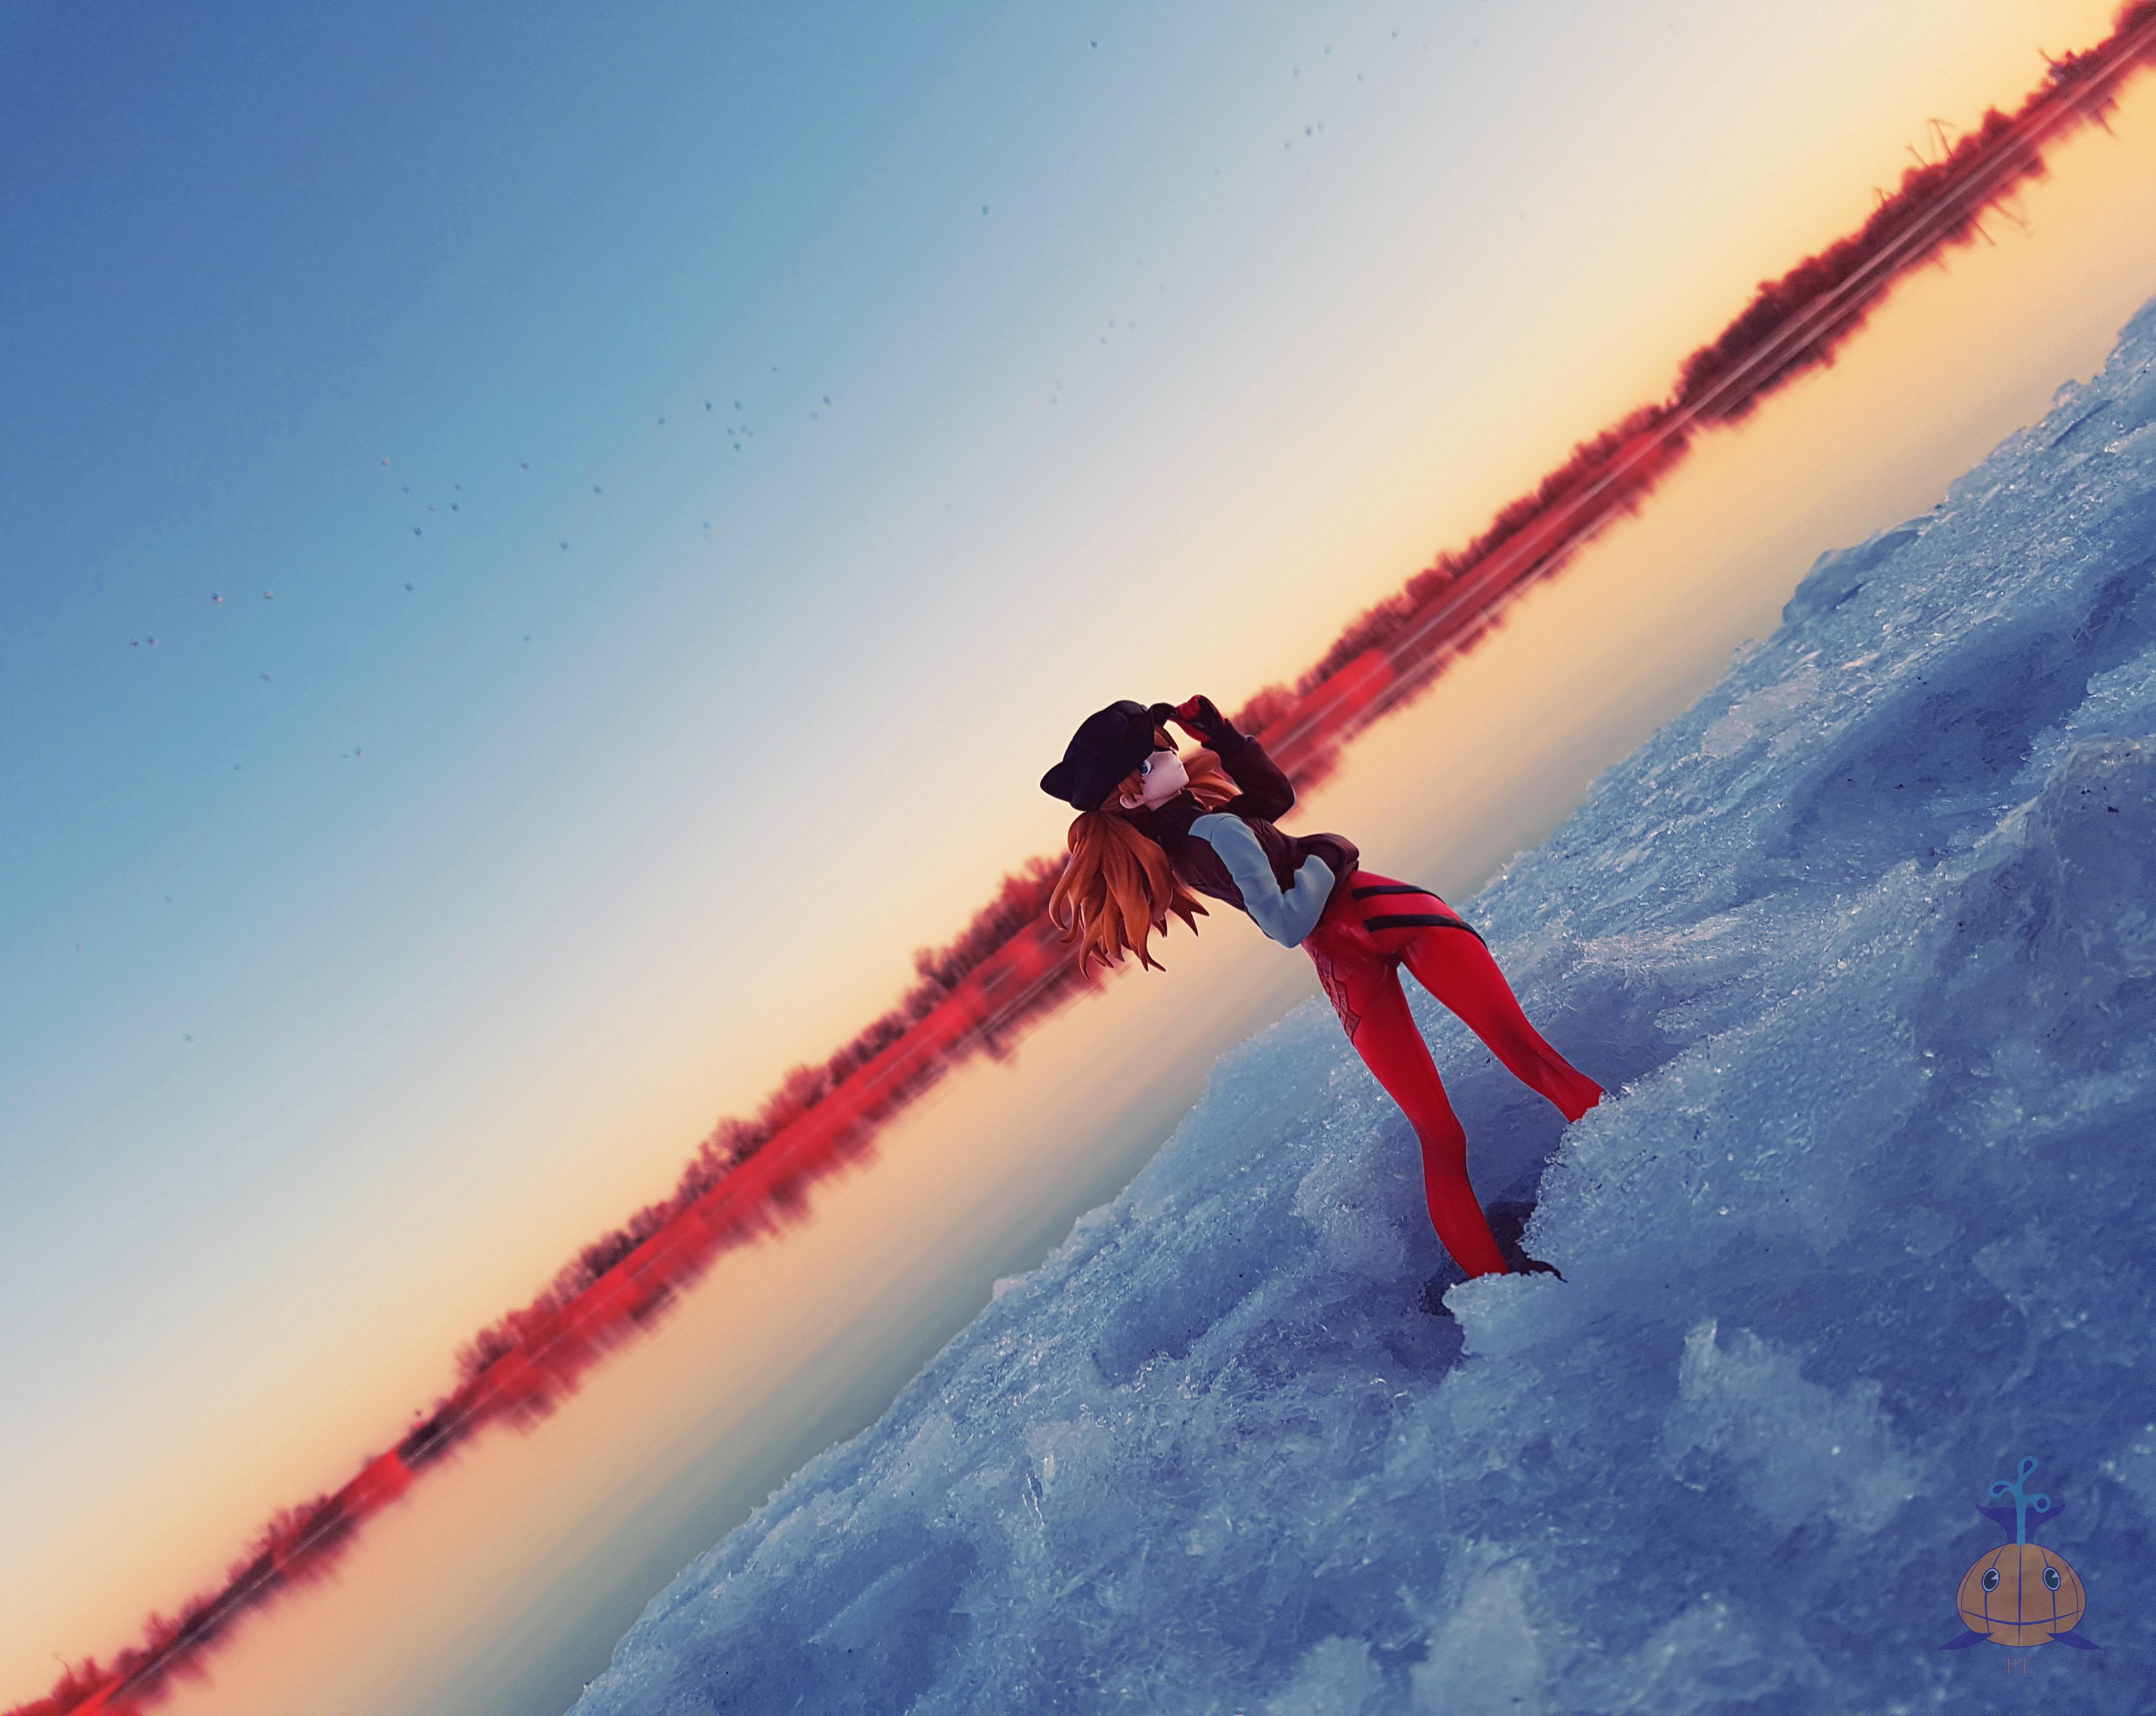 snow alter souryuu_asuka_langley river khara nobuta evangelion_shin_gekijouban:_q